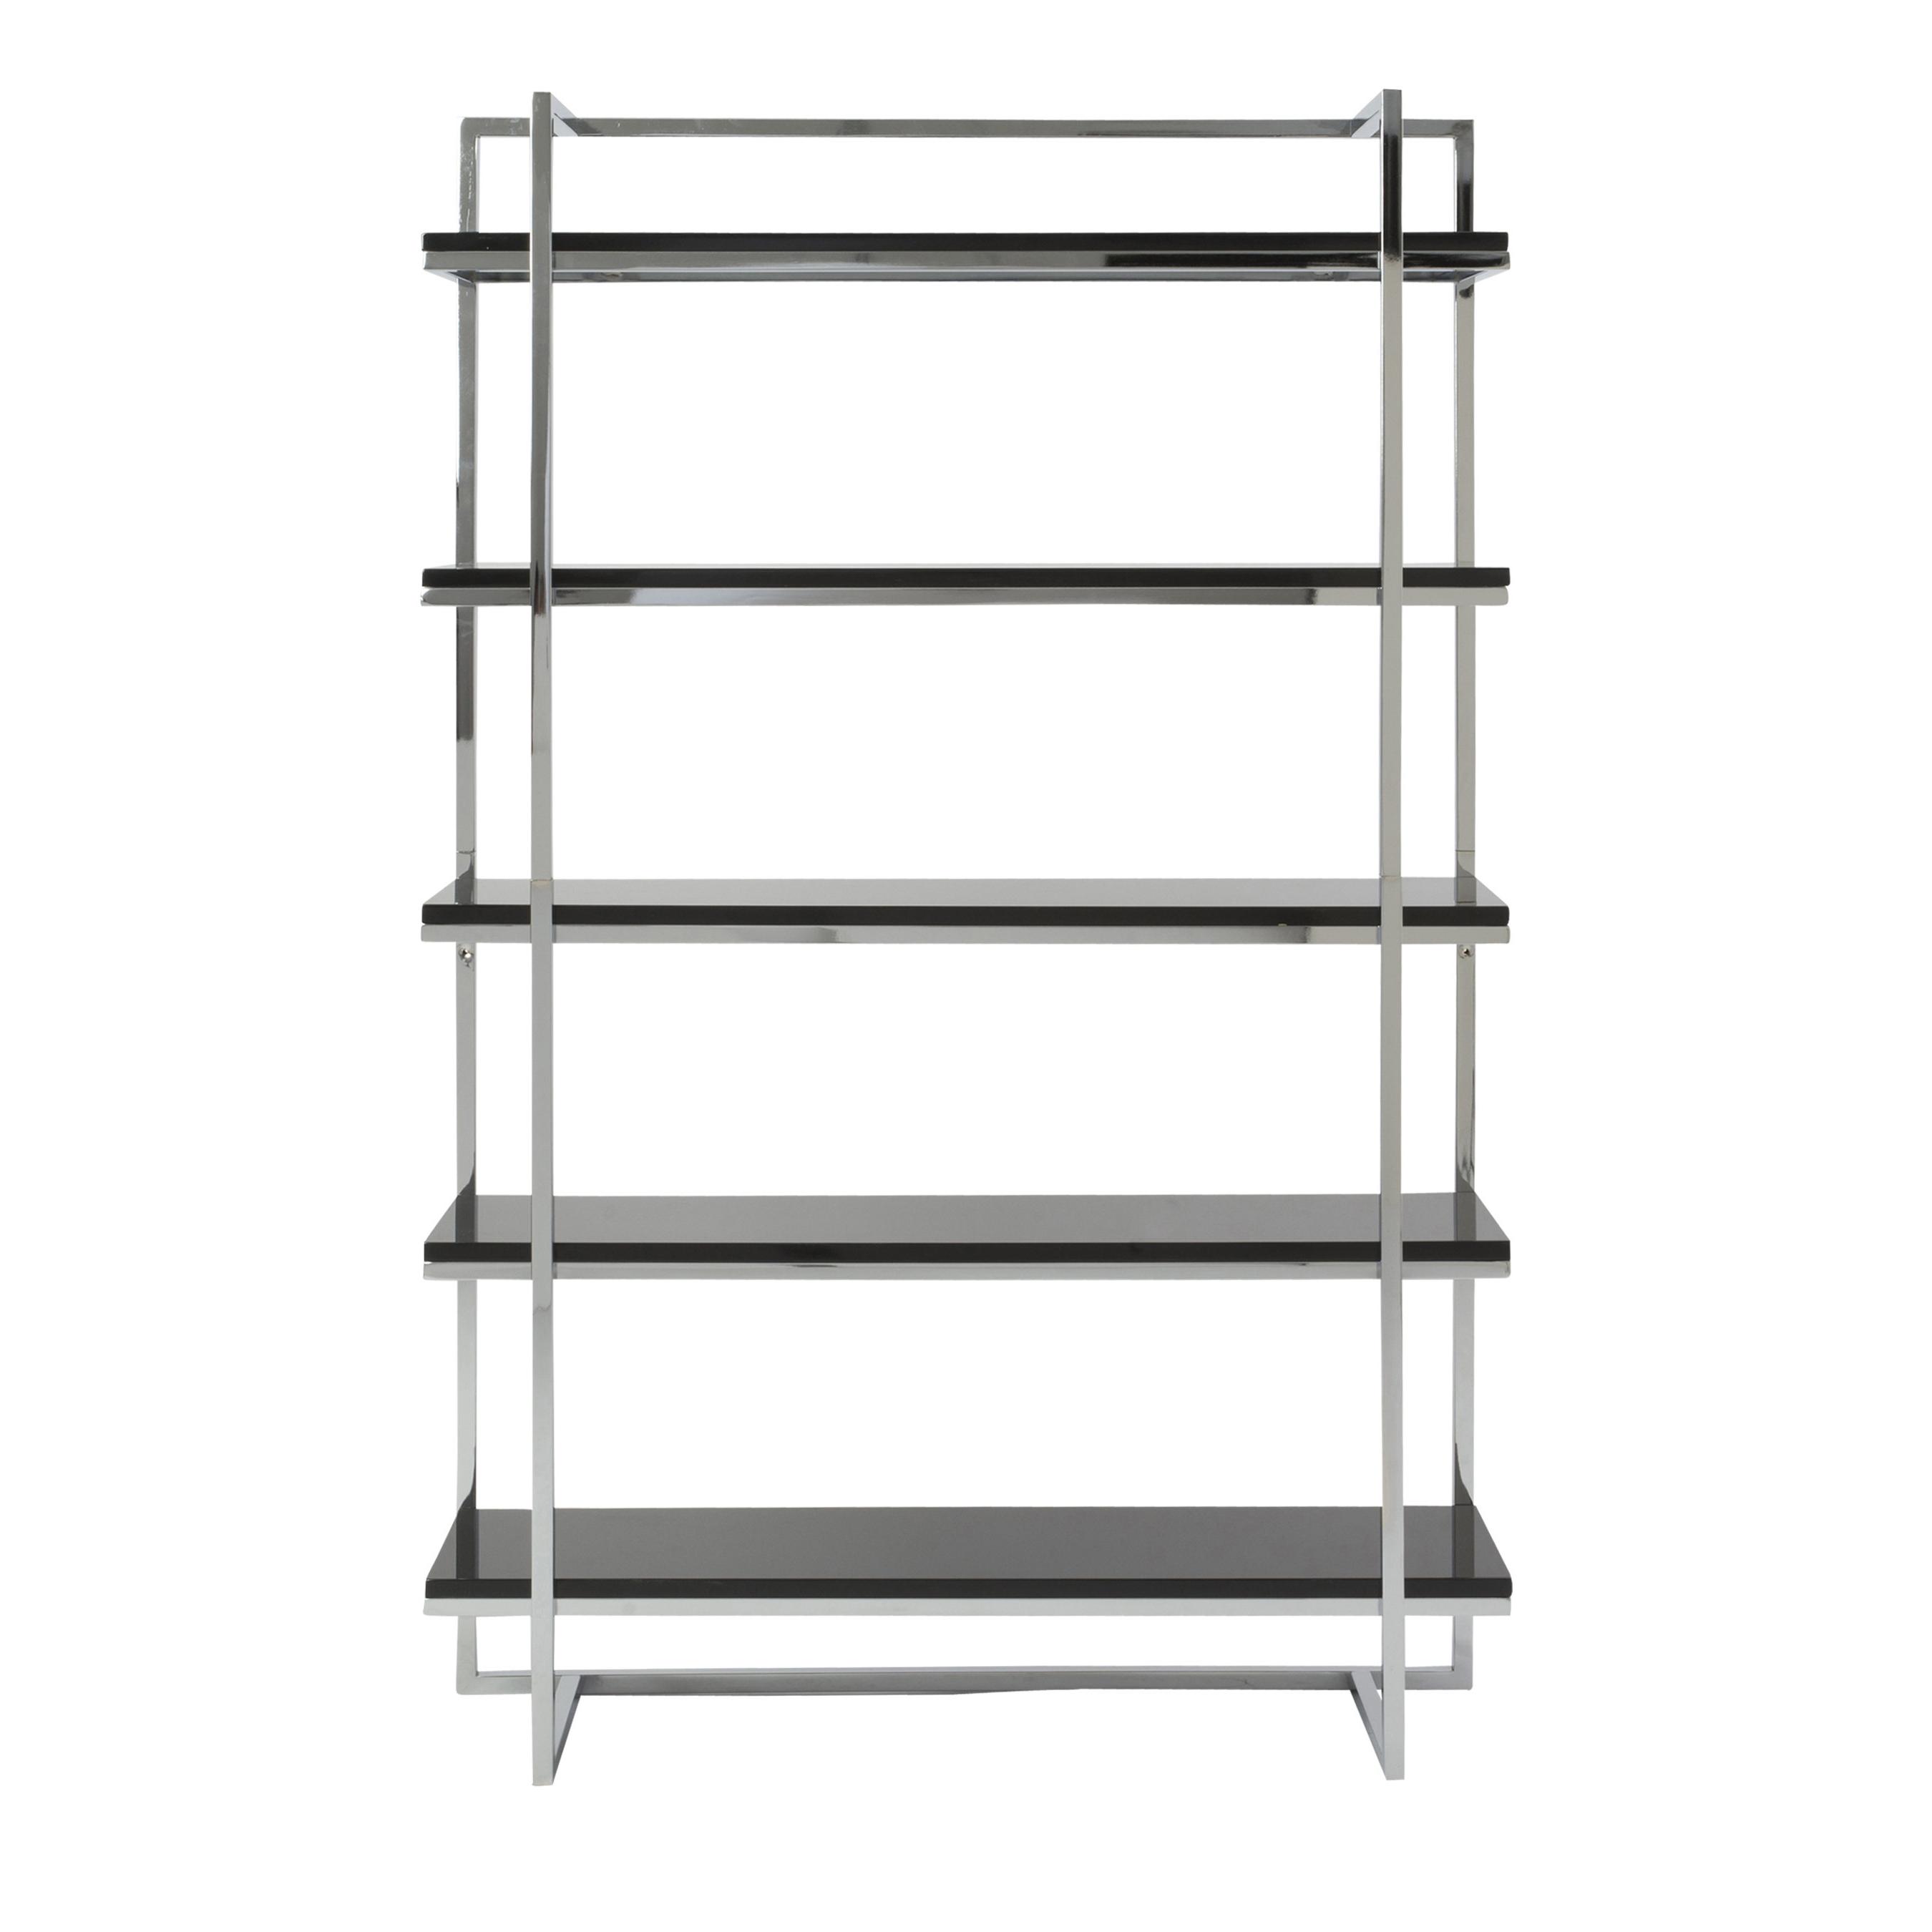 Tinoco Etagere Bookcase In 2020 Tinoco Storage Shelf Standard Bookcases (View 4 of 20)